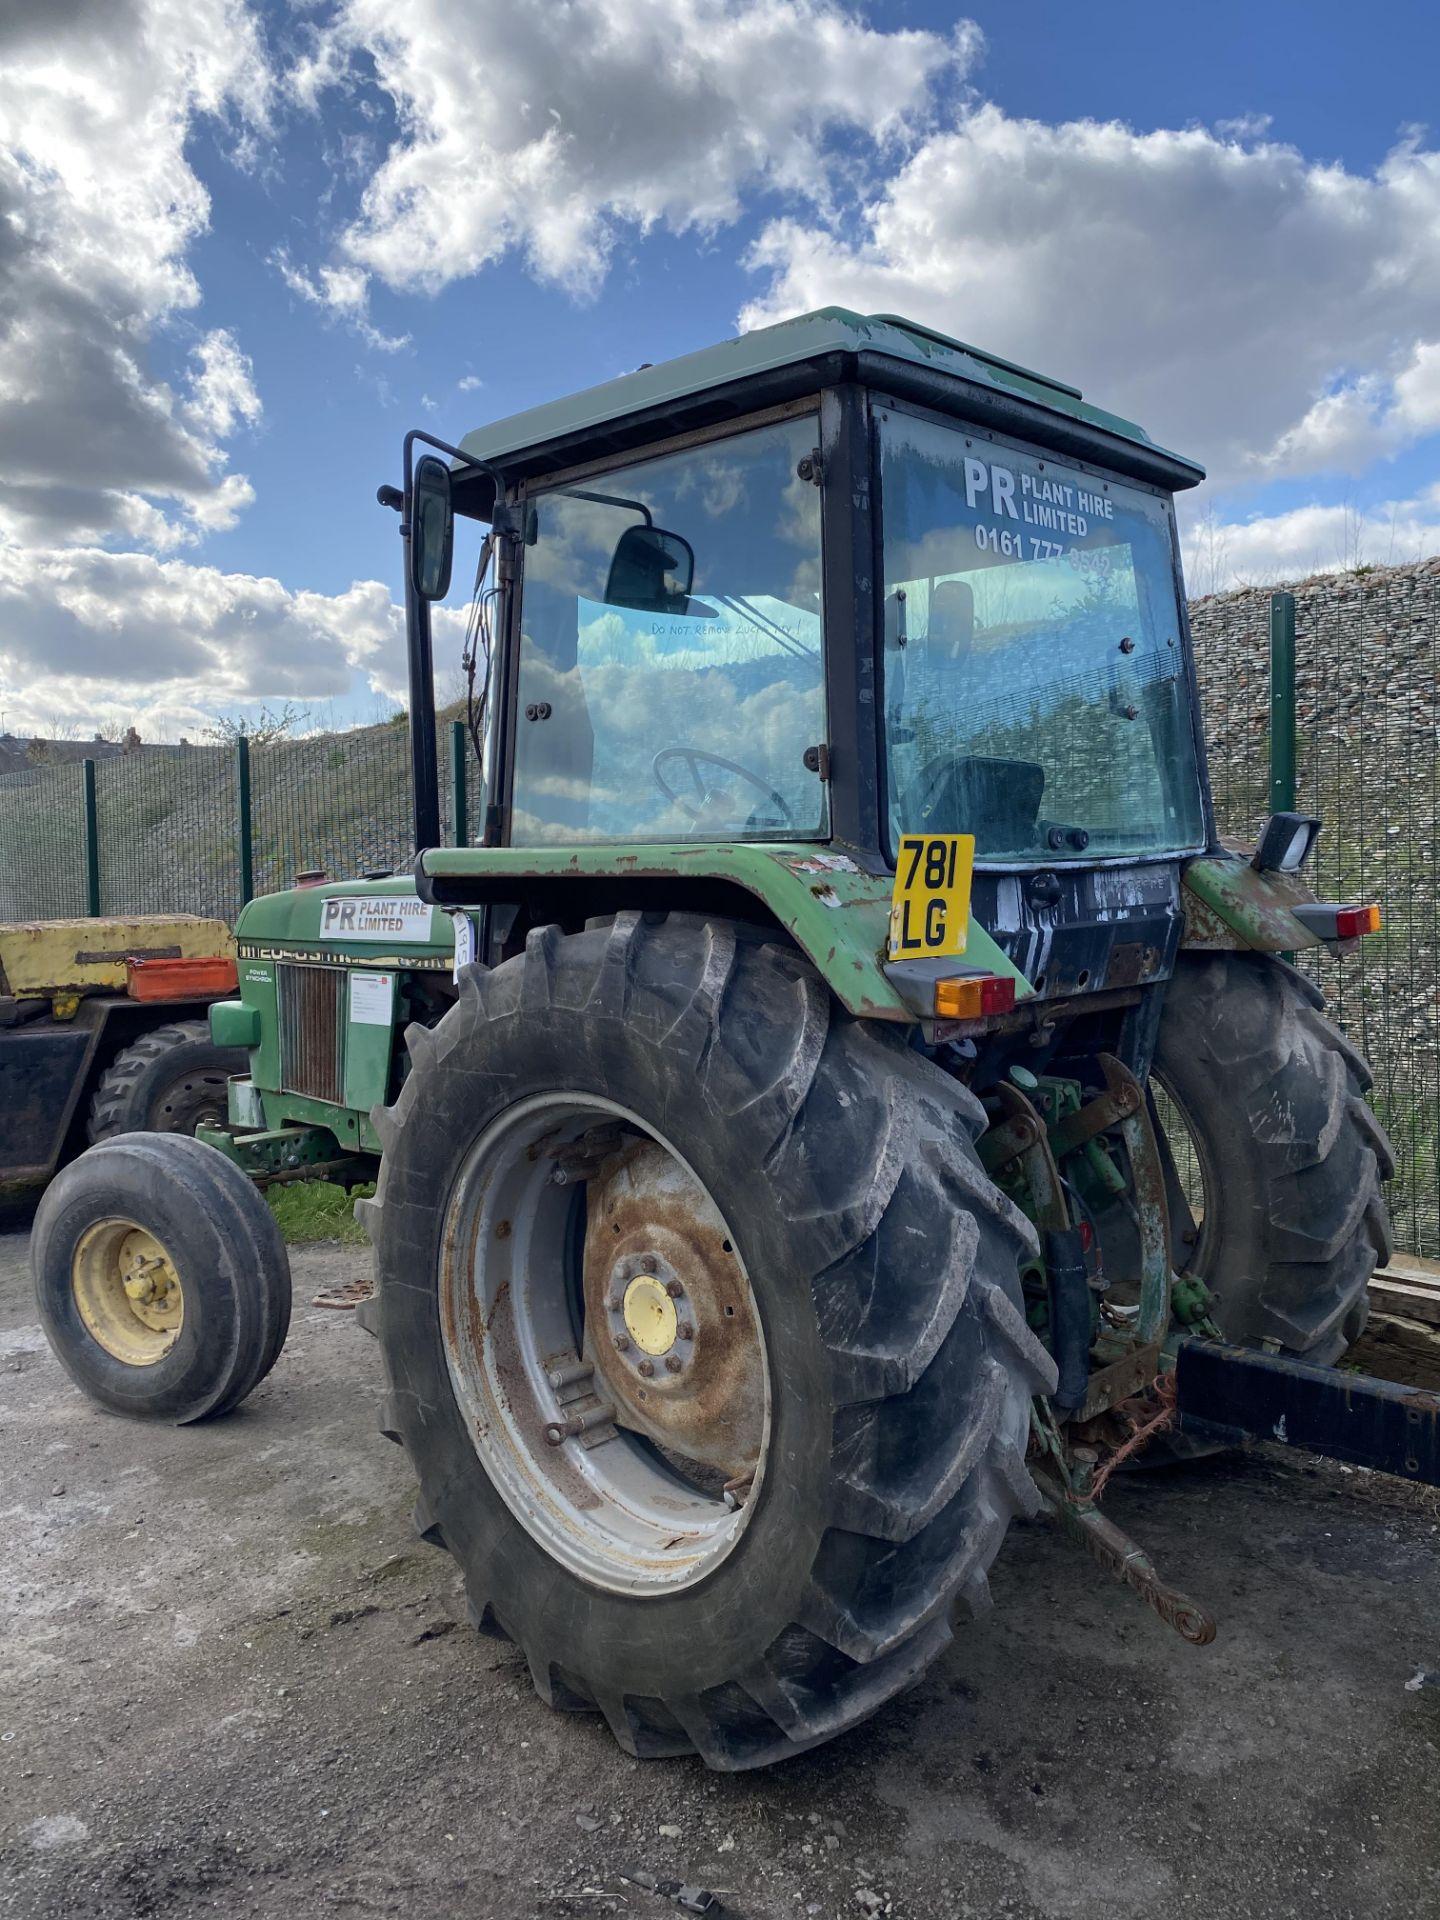 Lot 195 - John Deere 2040S AGRICULTURAL TRACTOR, serial no.